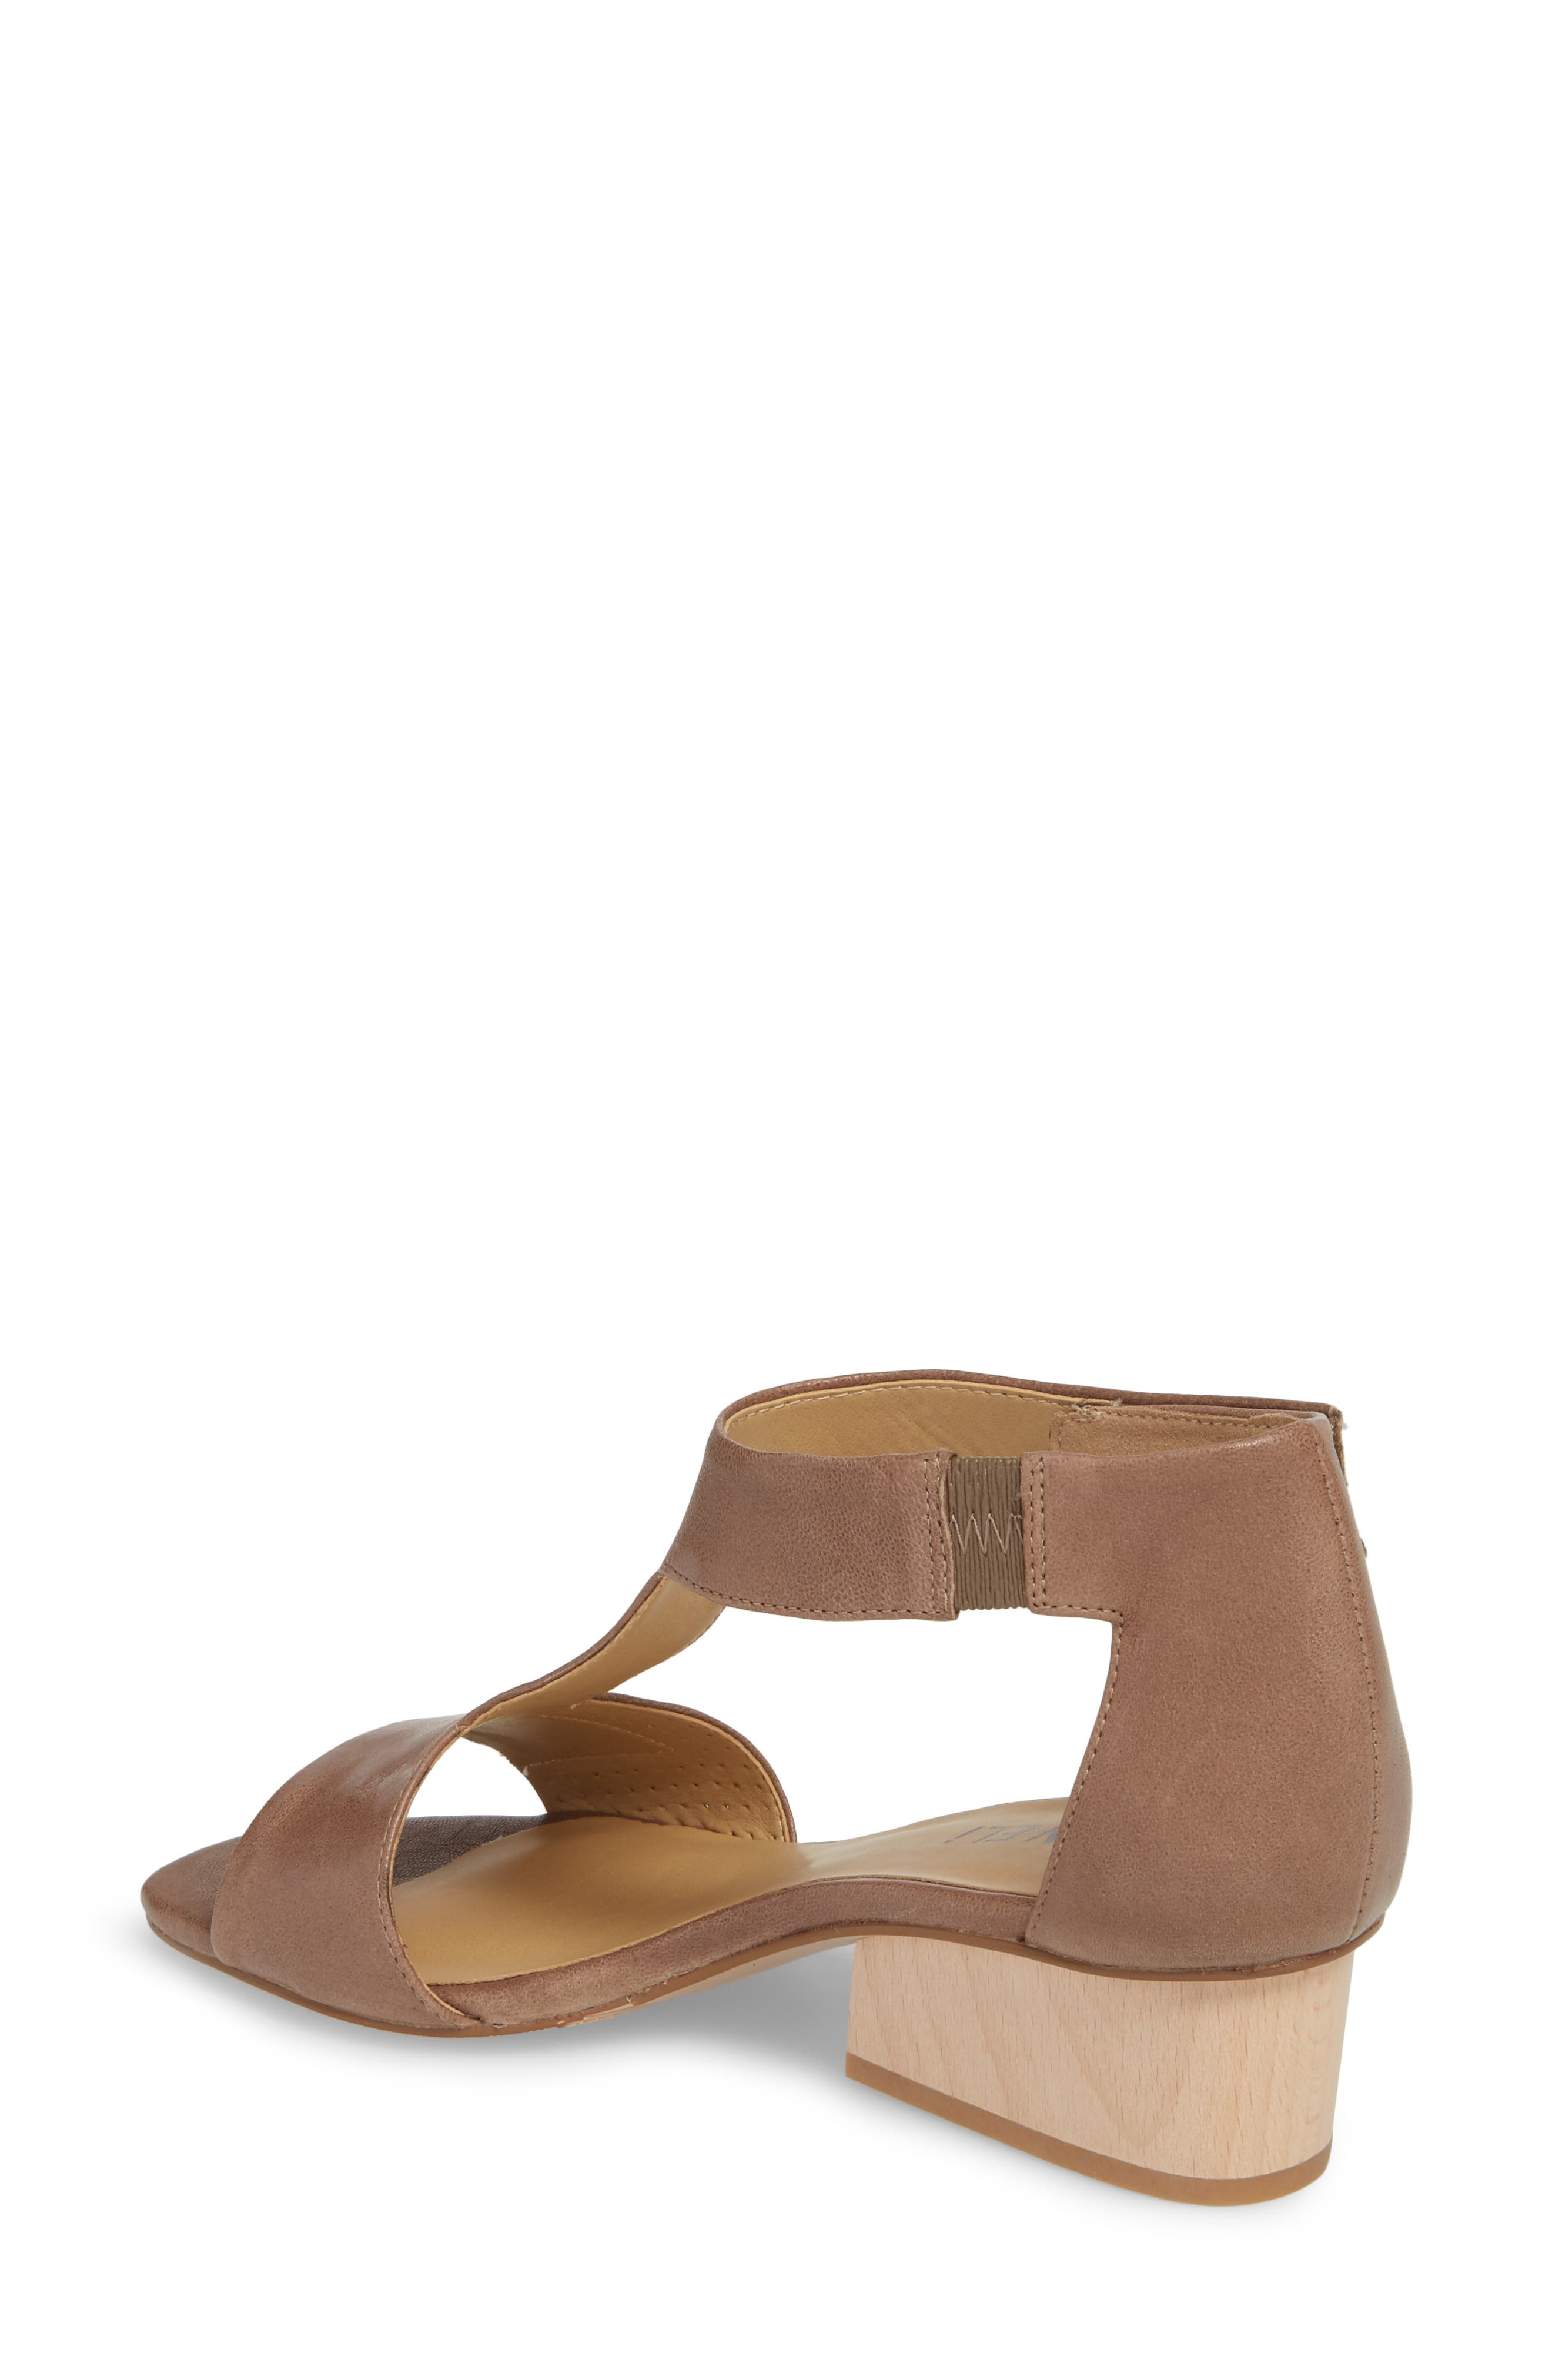 VANELI, Calyx Block Heel Sandal, Alternate thumbnail 2, color, STONE LEATHER